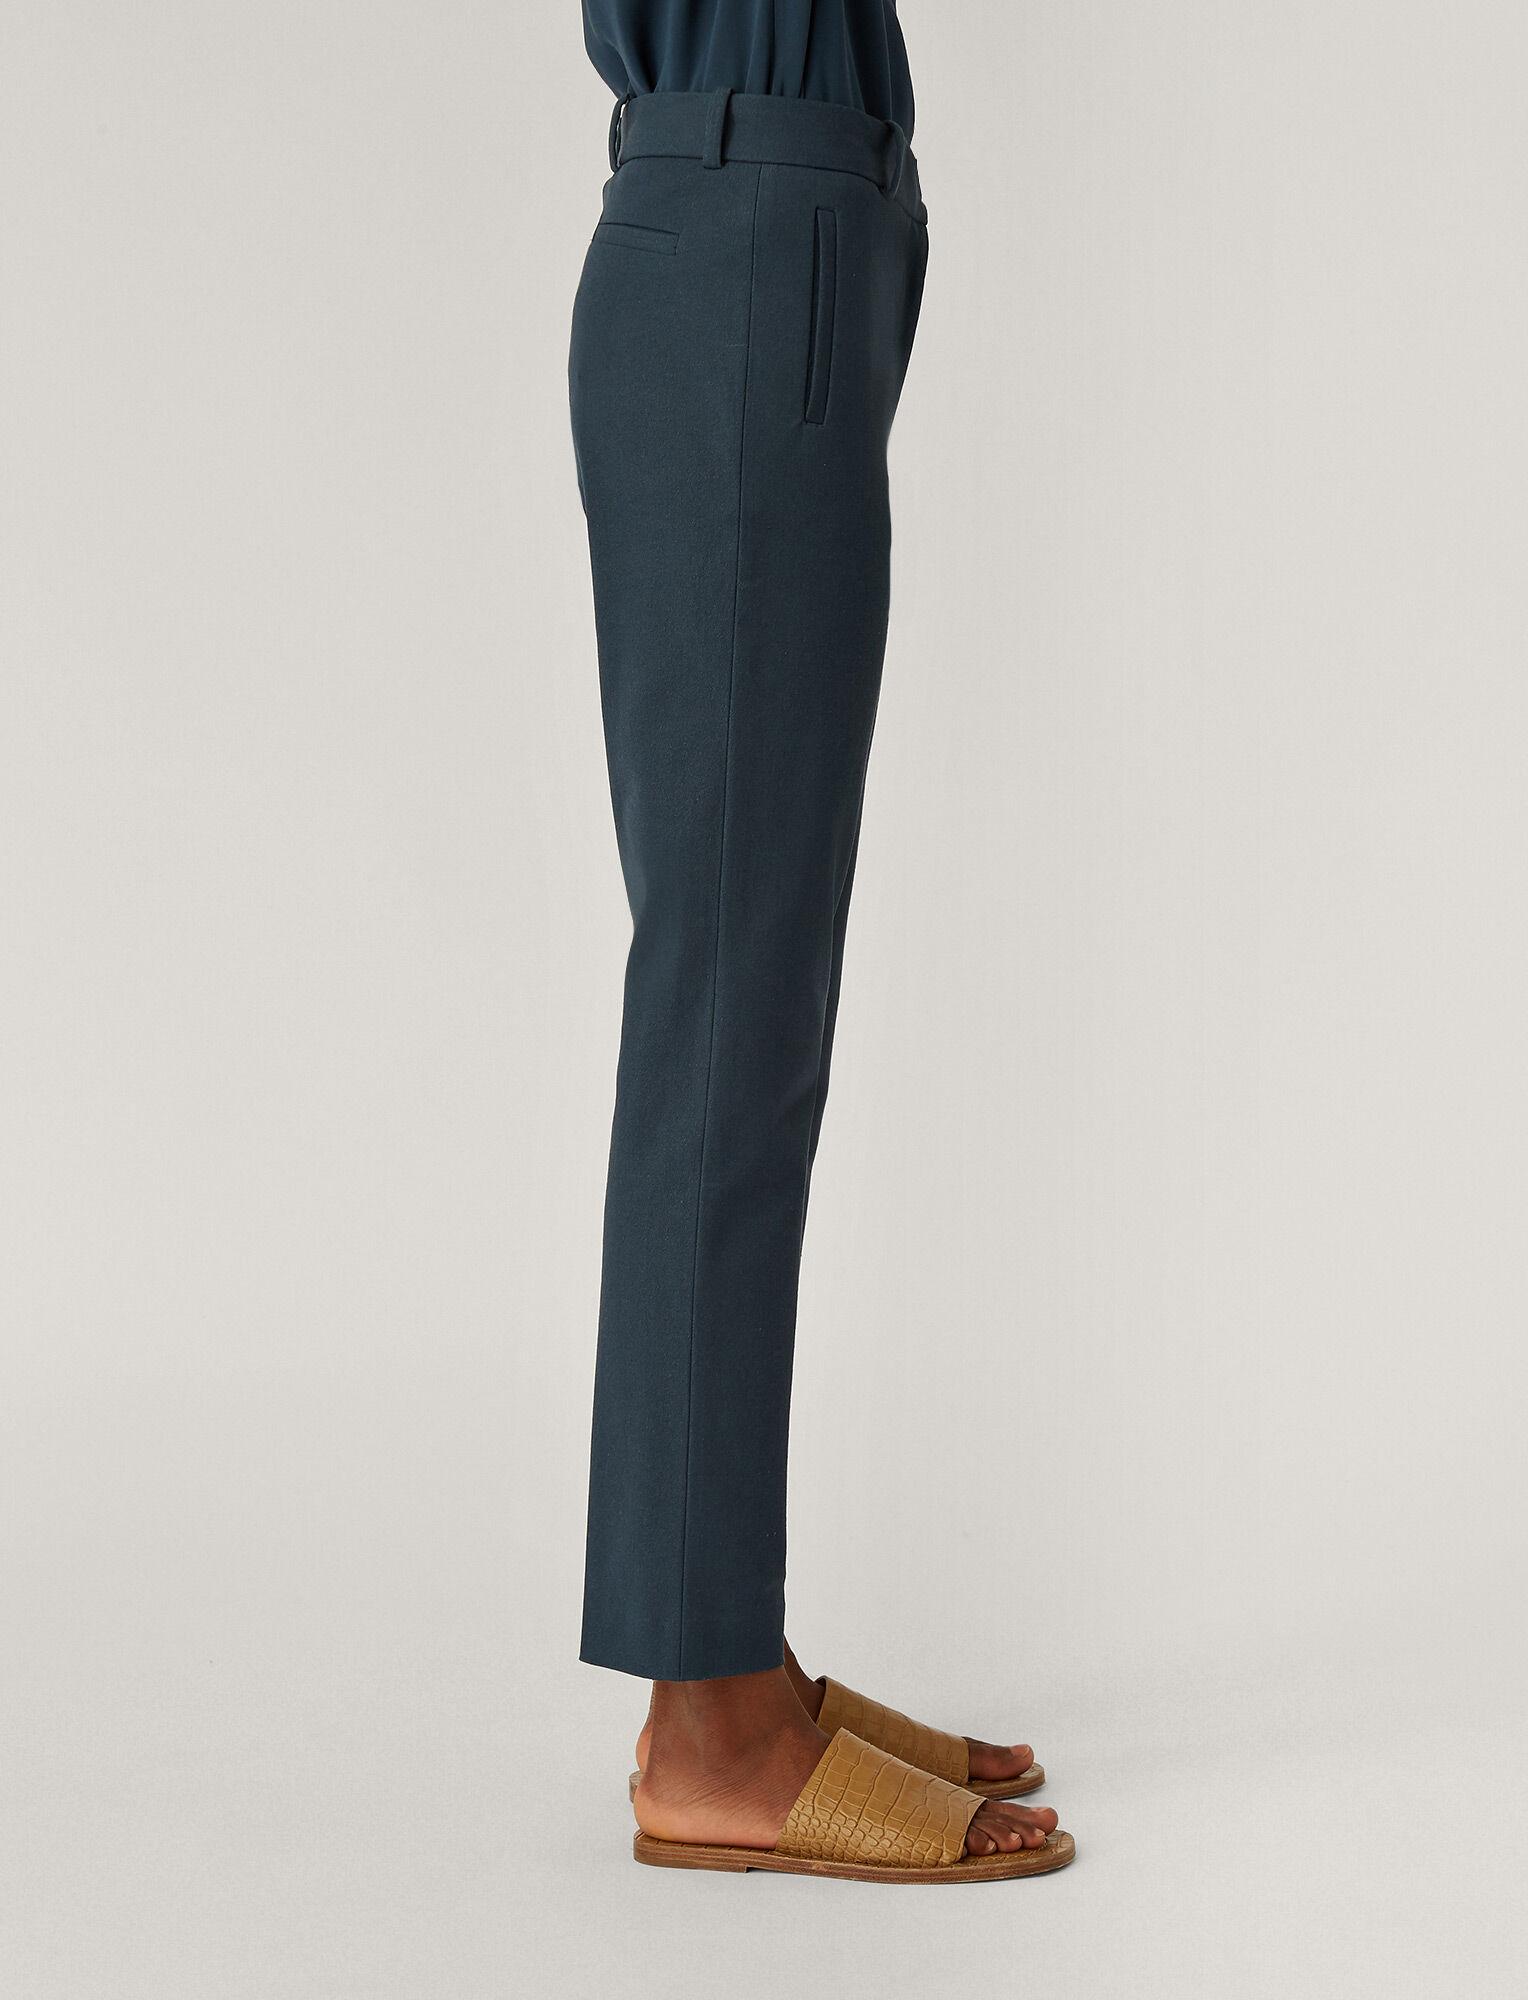 Joseph, New Eliston Gabardine Stretch Trousers, in Petrol